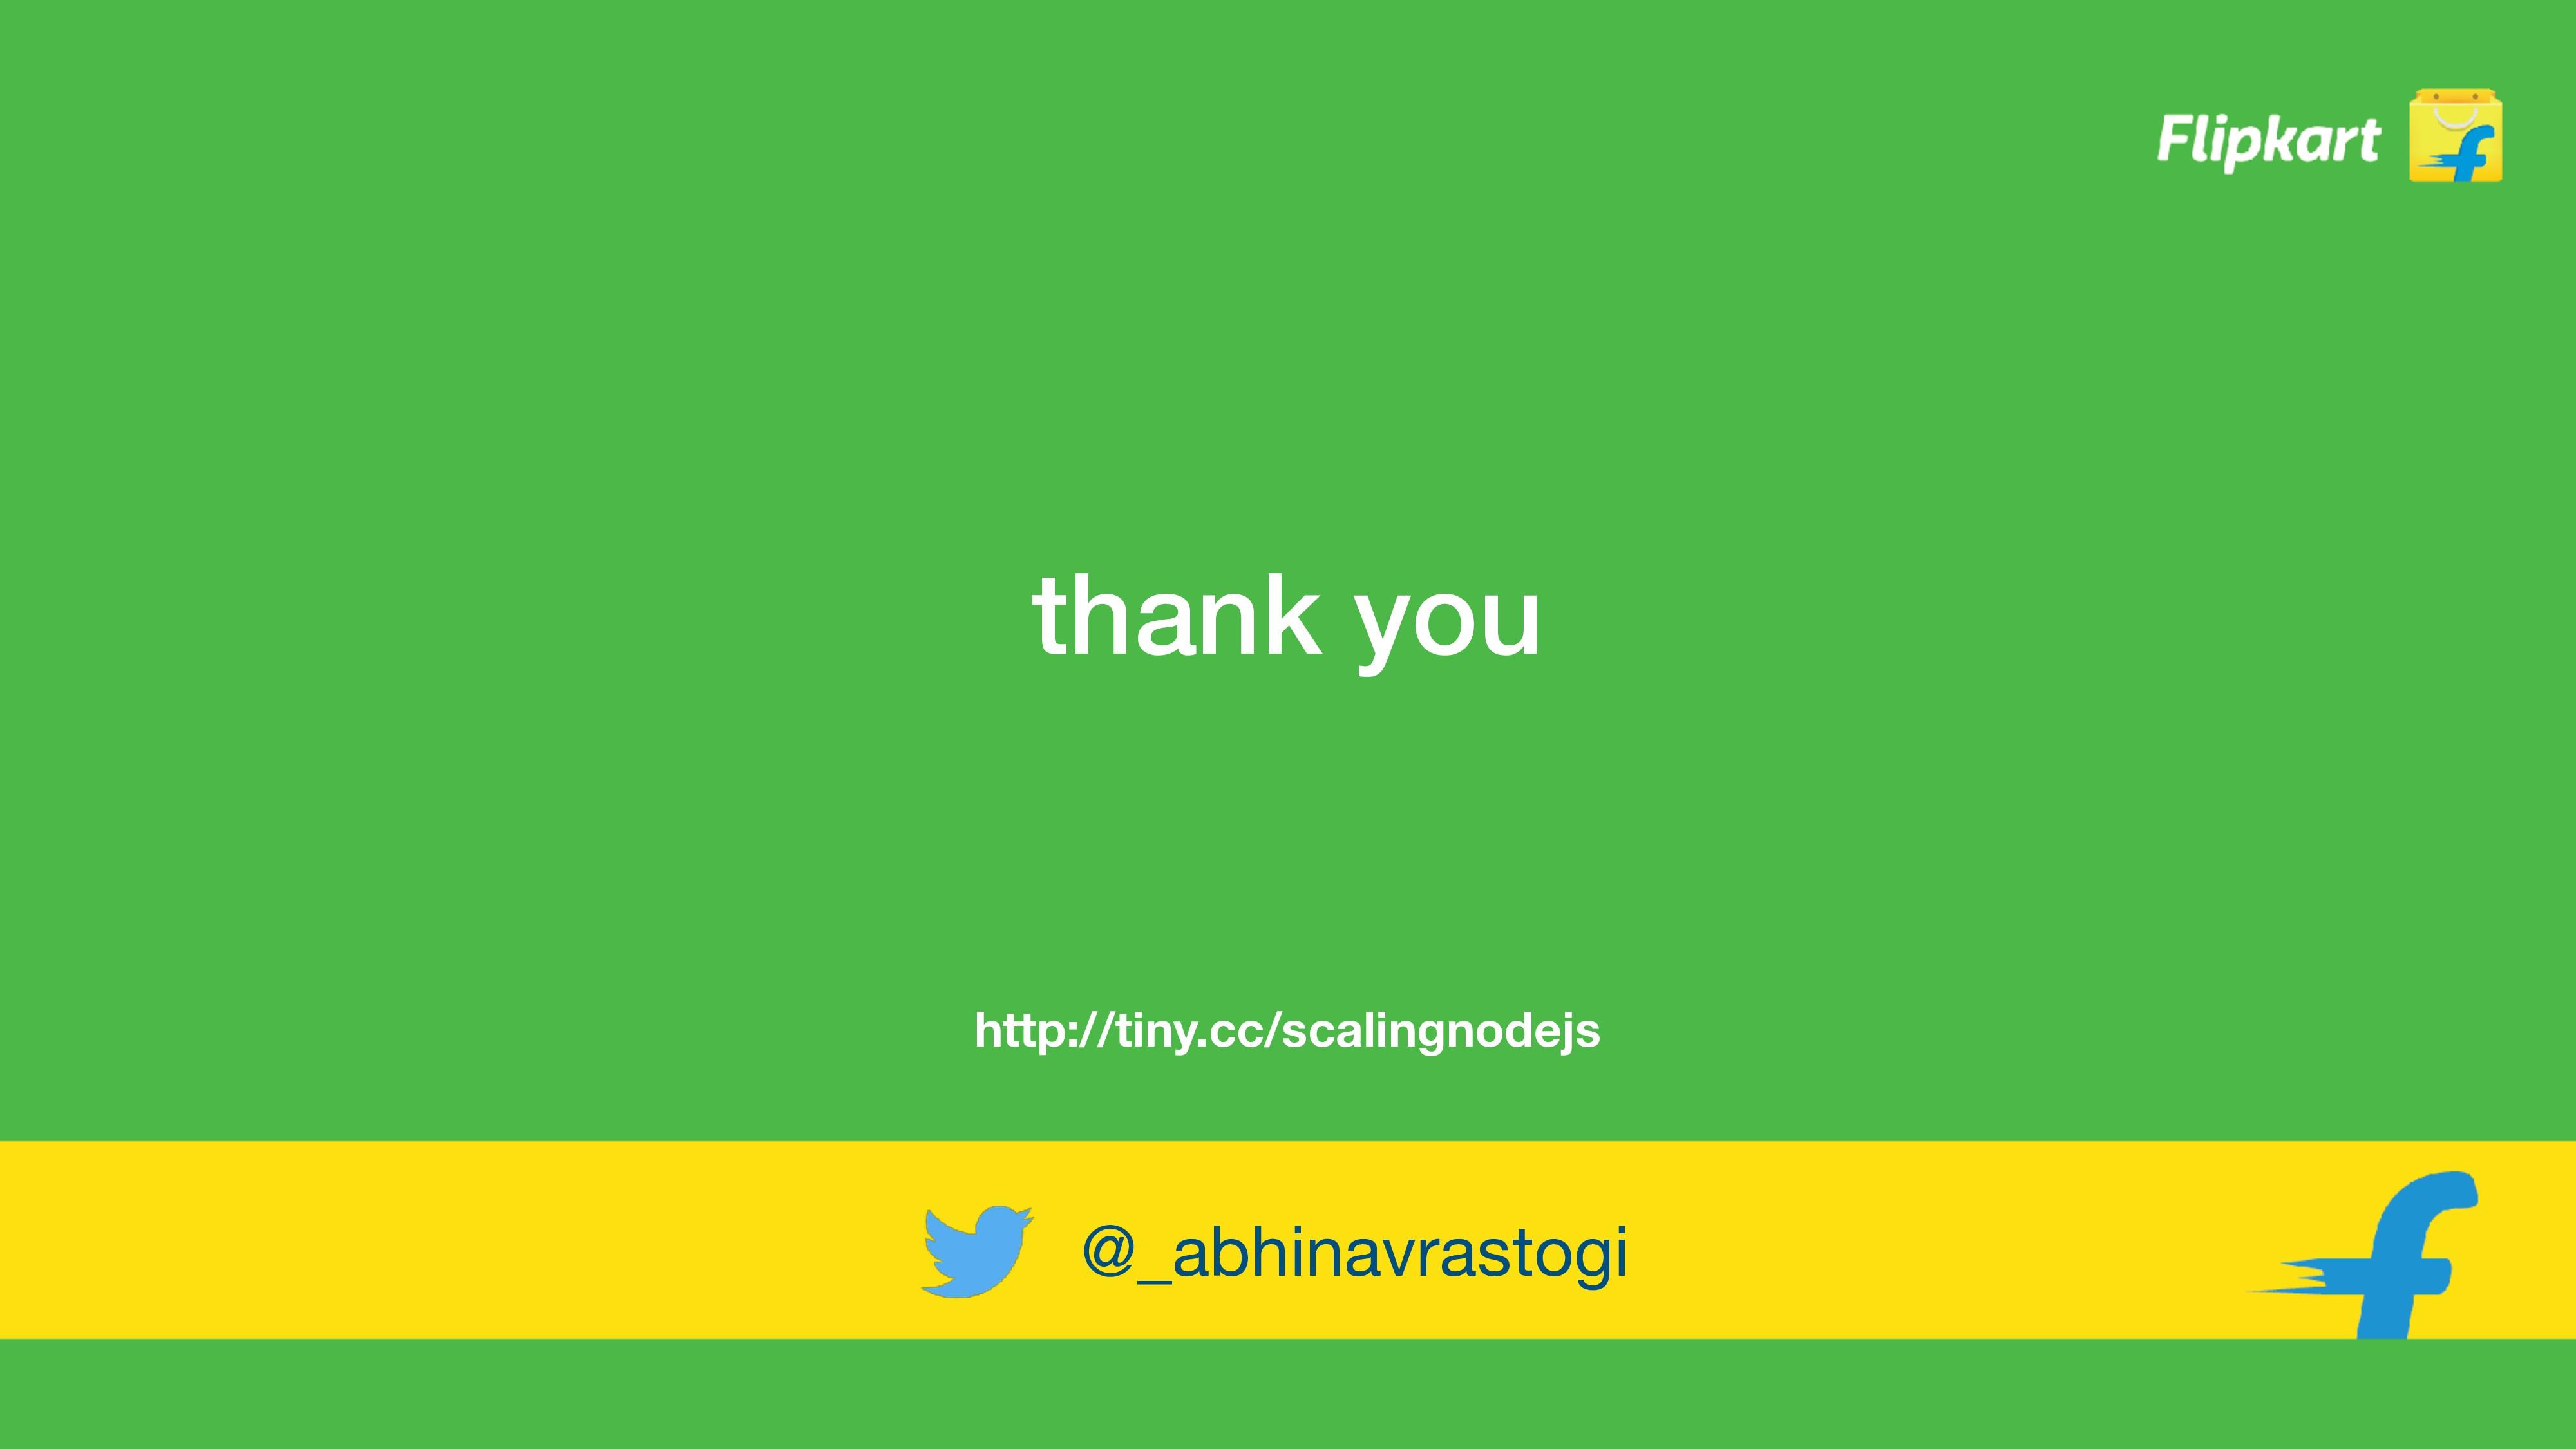 thank you @_abhinavrastogi http://tiny.cc/scali...